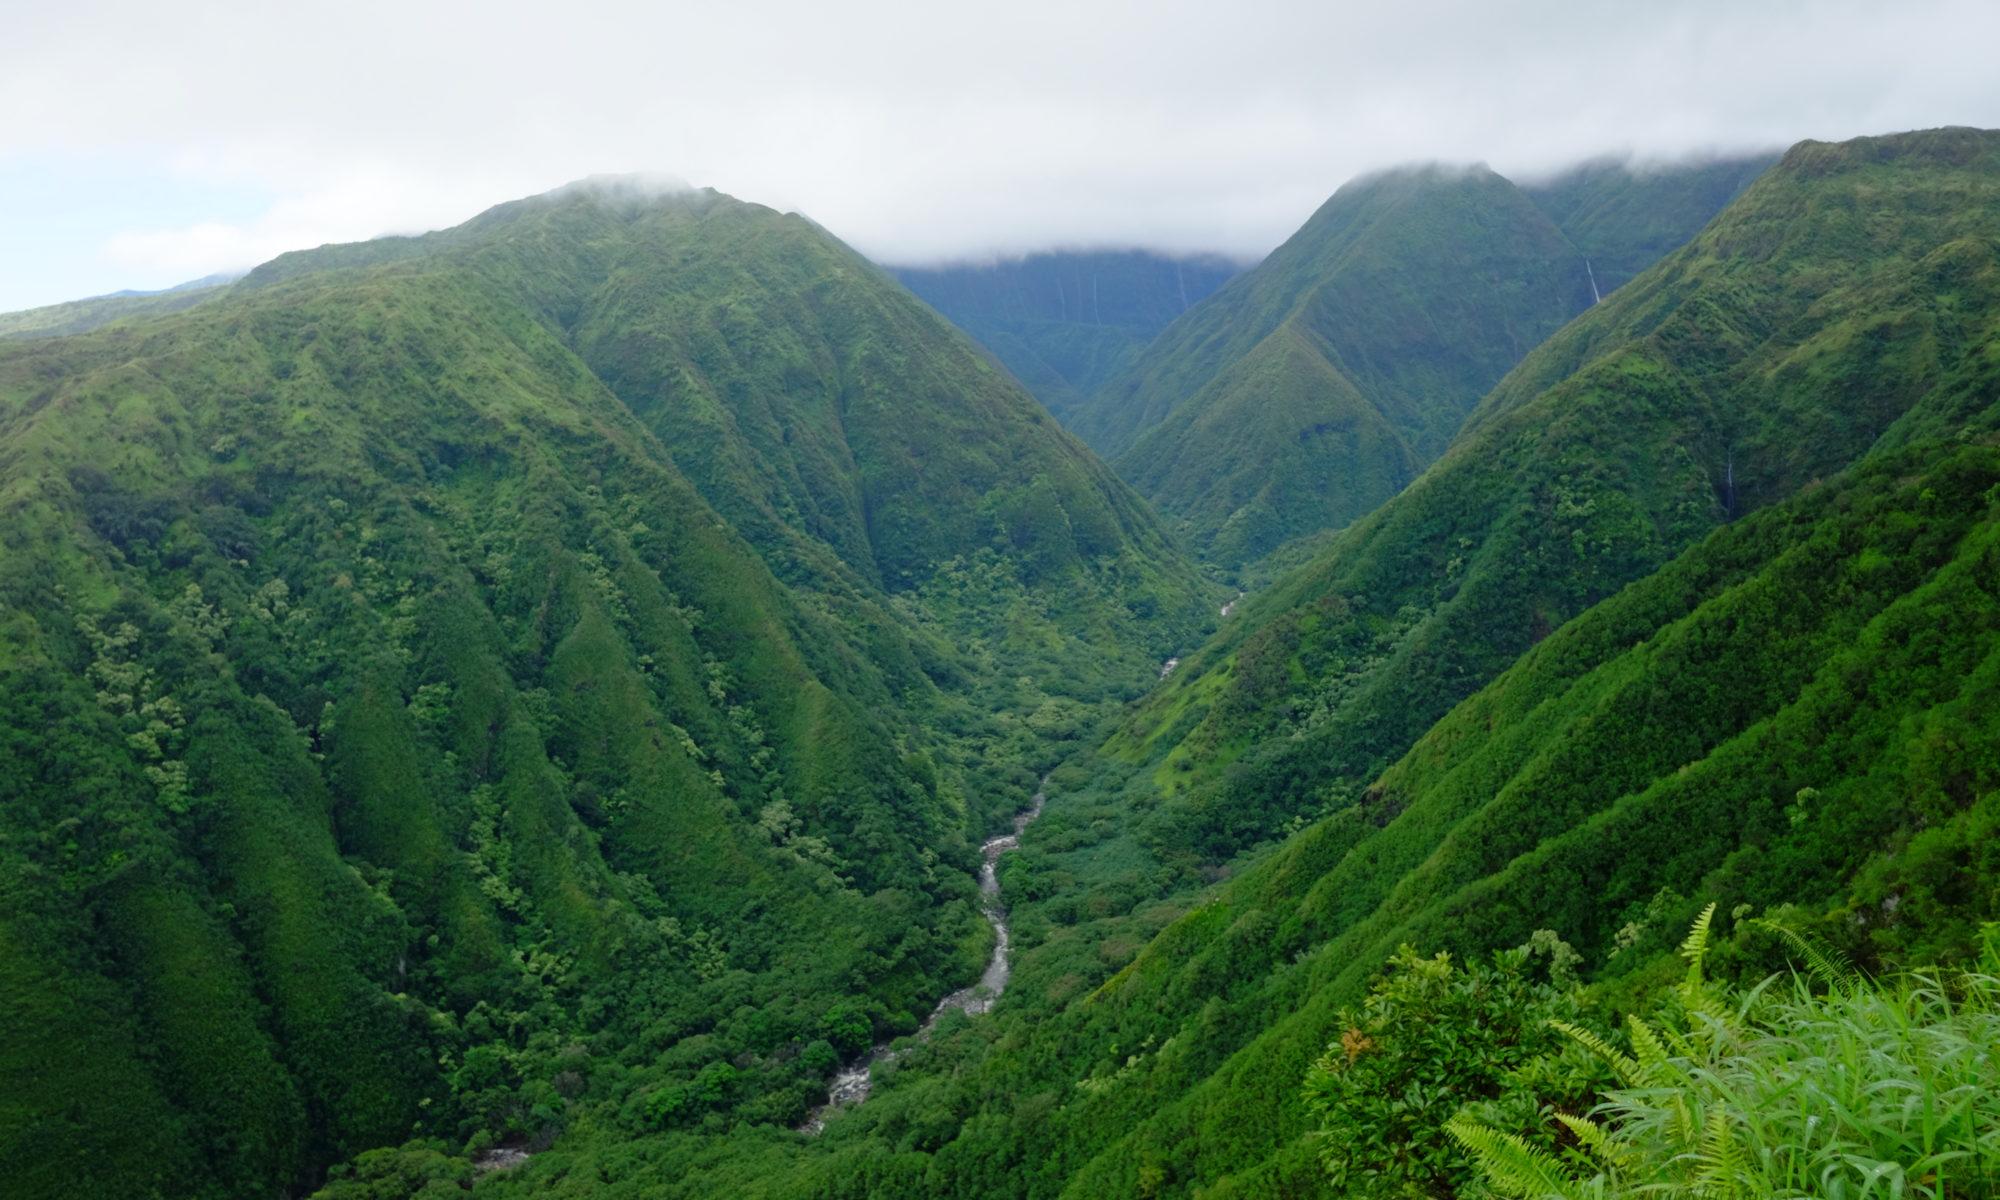 Maui Nui Natural History